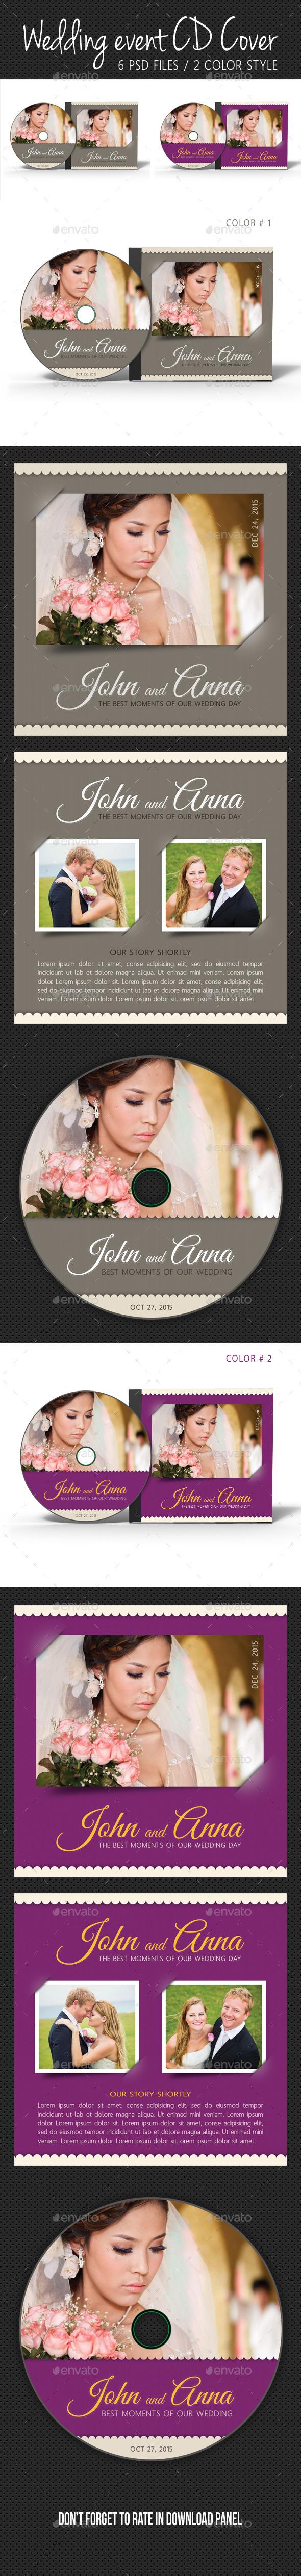 Wedding Event CD Cover V11 - CD & DVD Artwork Print Templates